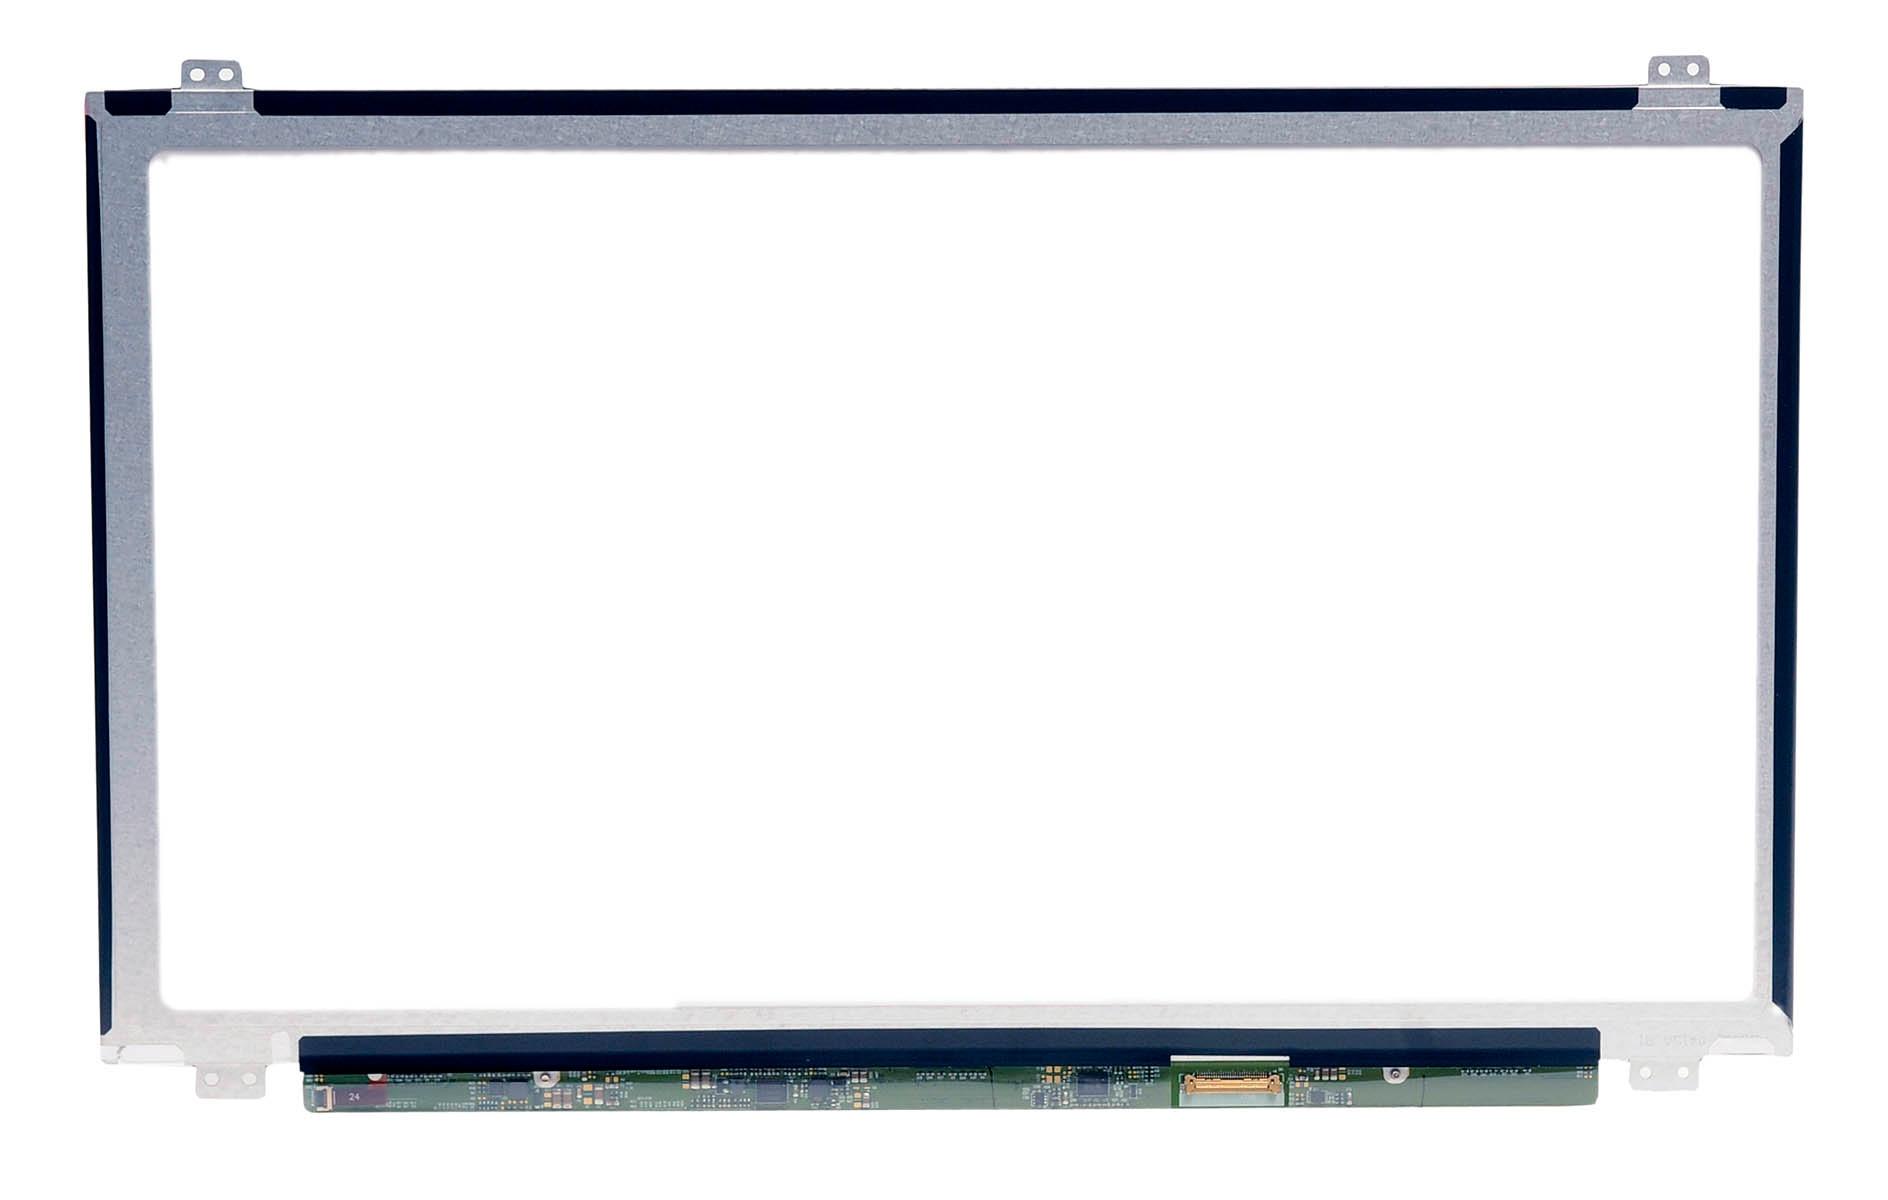 New Lenovo FRU 18201670 for Z50-75 N156BGE-EB1 C2 LCD Screen LED for Laptop